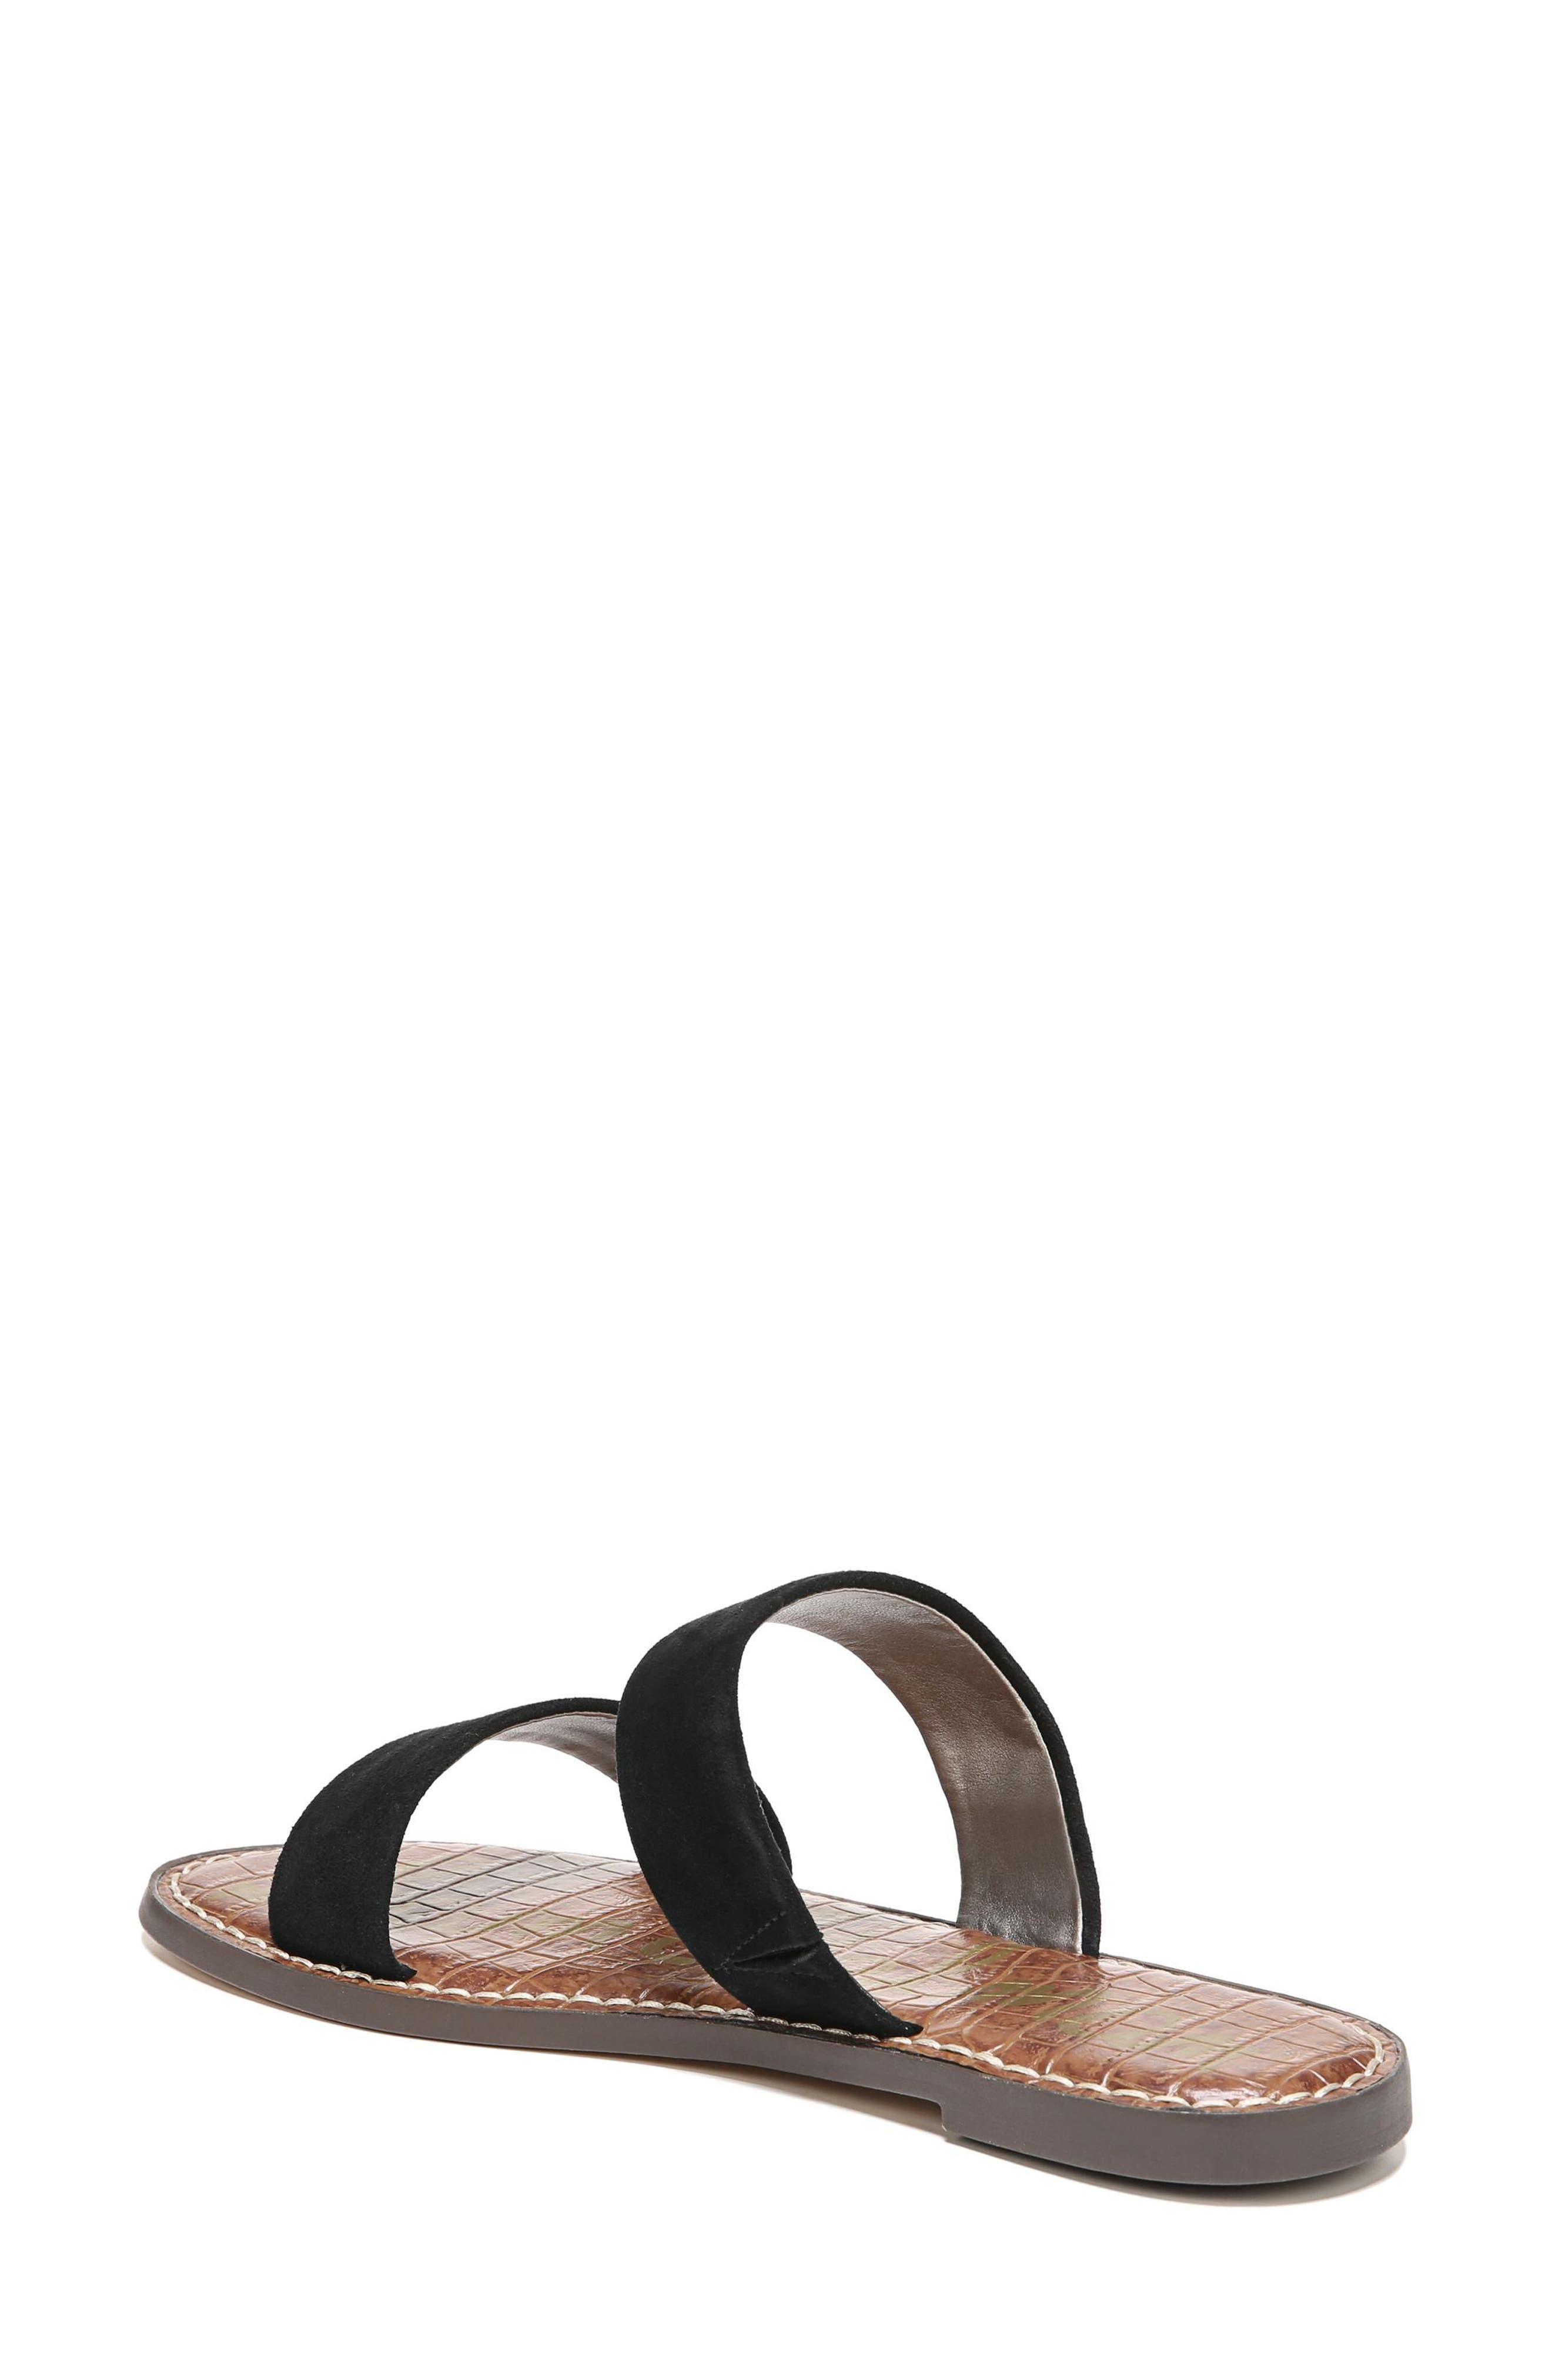 Gala Two Strap Slide Sandal,                             Alternate thumbnail 2, color,                             BLACK SUEDE